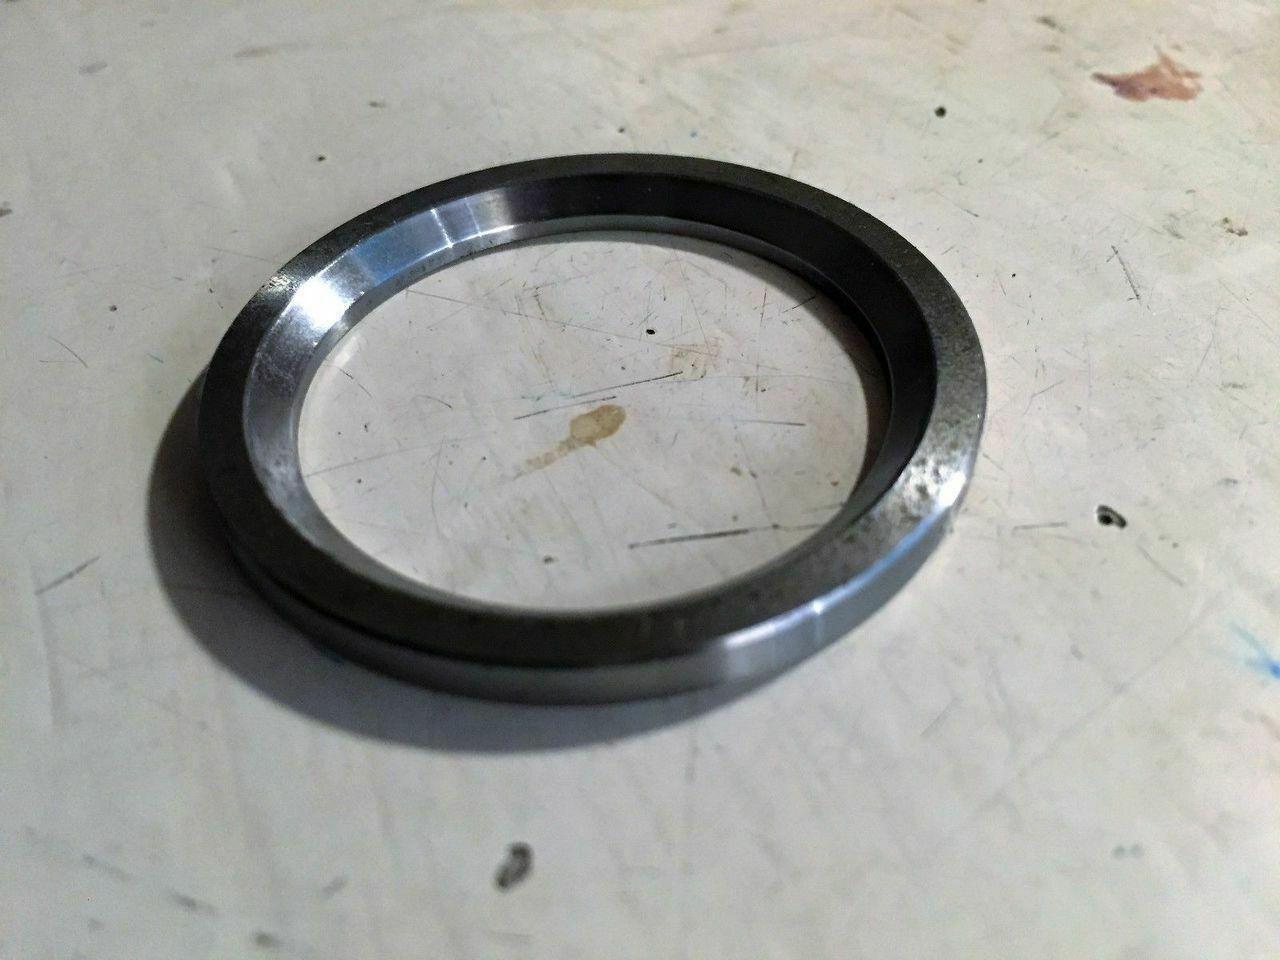 VINTAGE BMW FRONT CRANKSHAFT SPACER RING. R26+27 TWINS NEW - 11 11 0 016 114